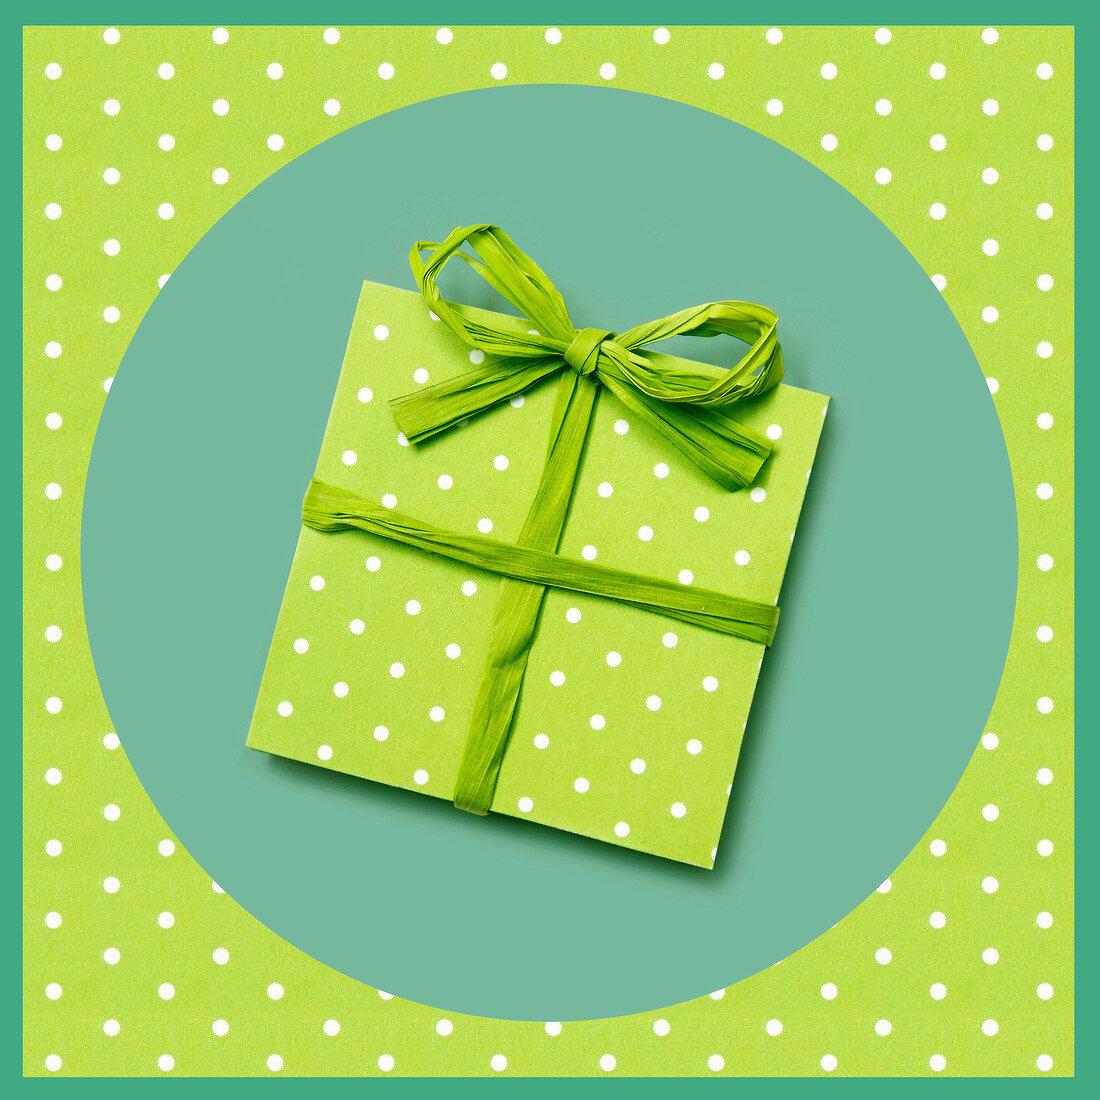 Green Birthday present